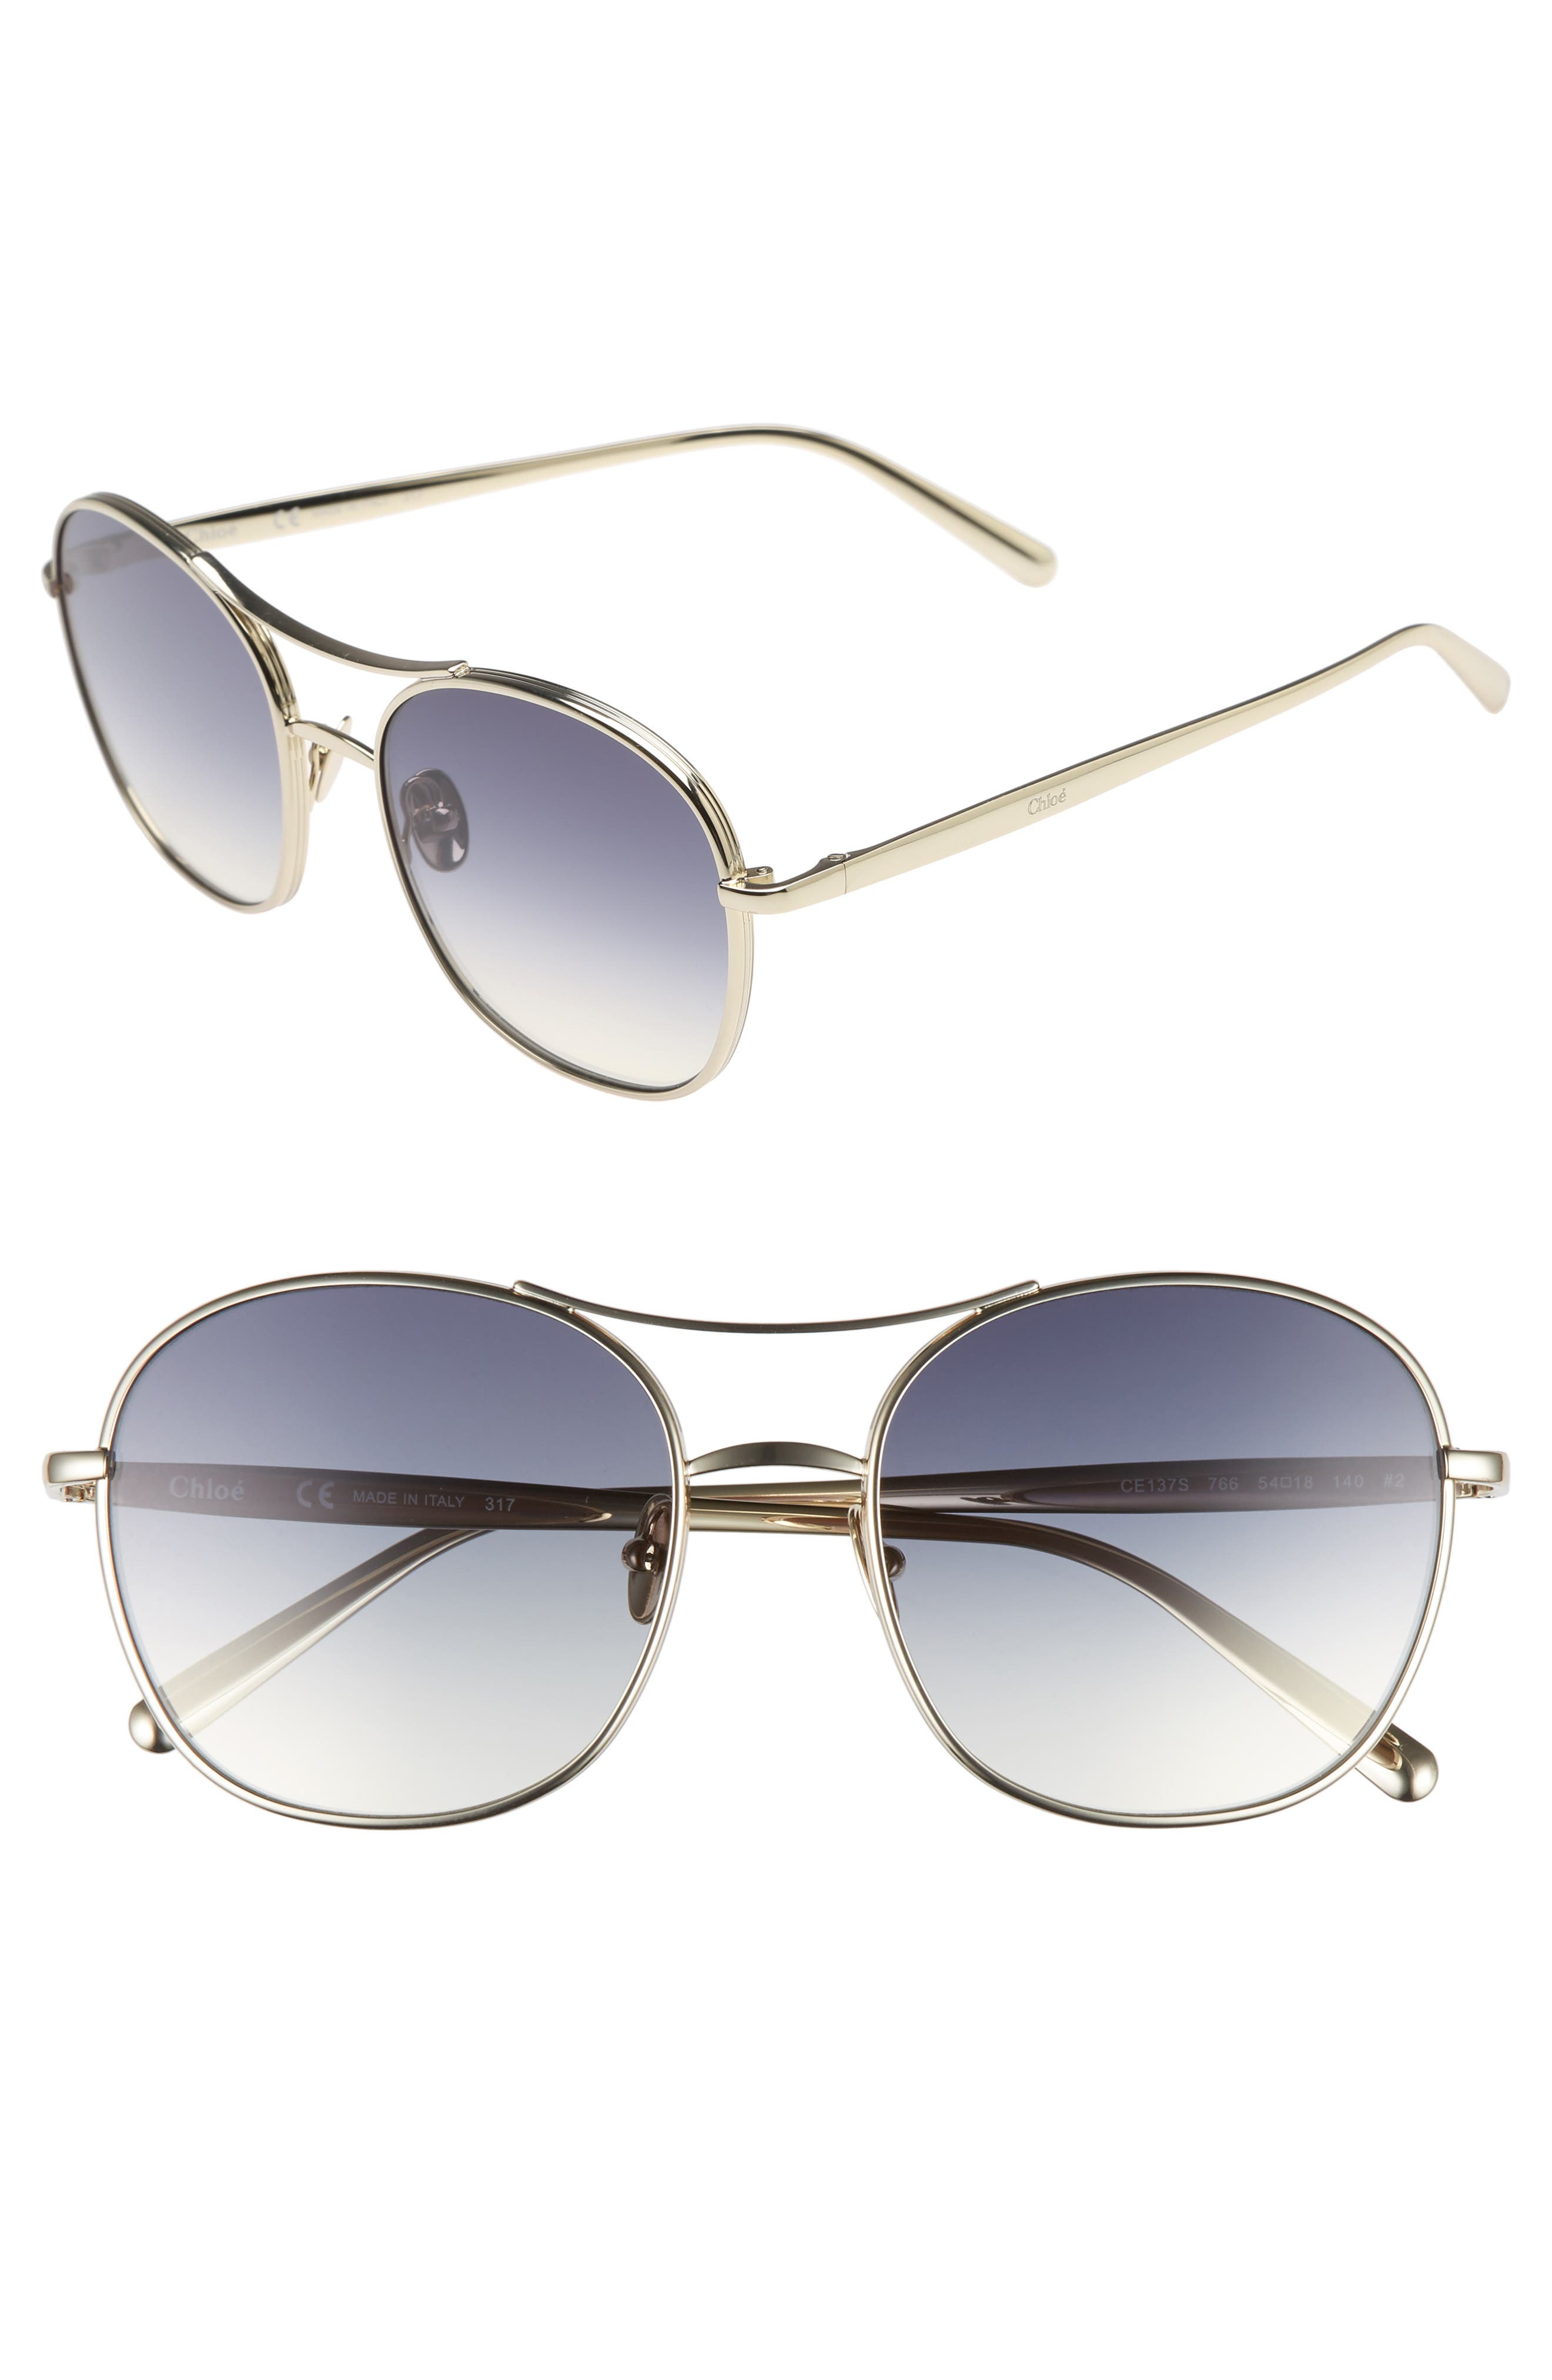 54mm Aviator Sunglasses,                         Main,                         color, 710